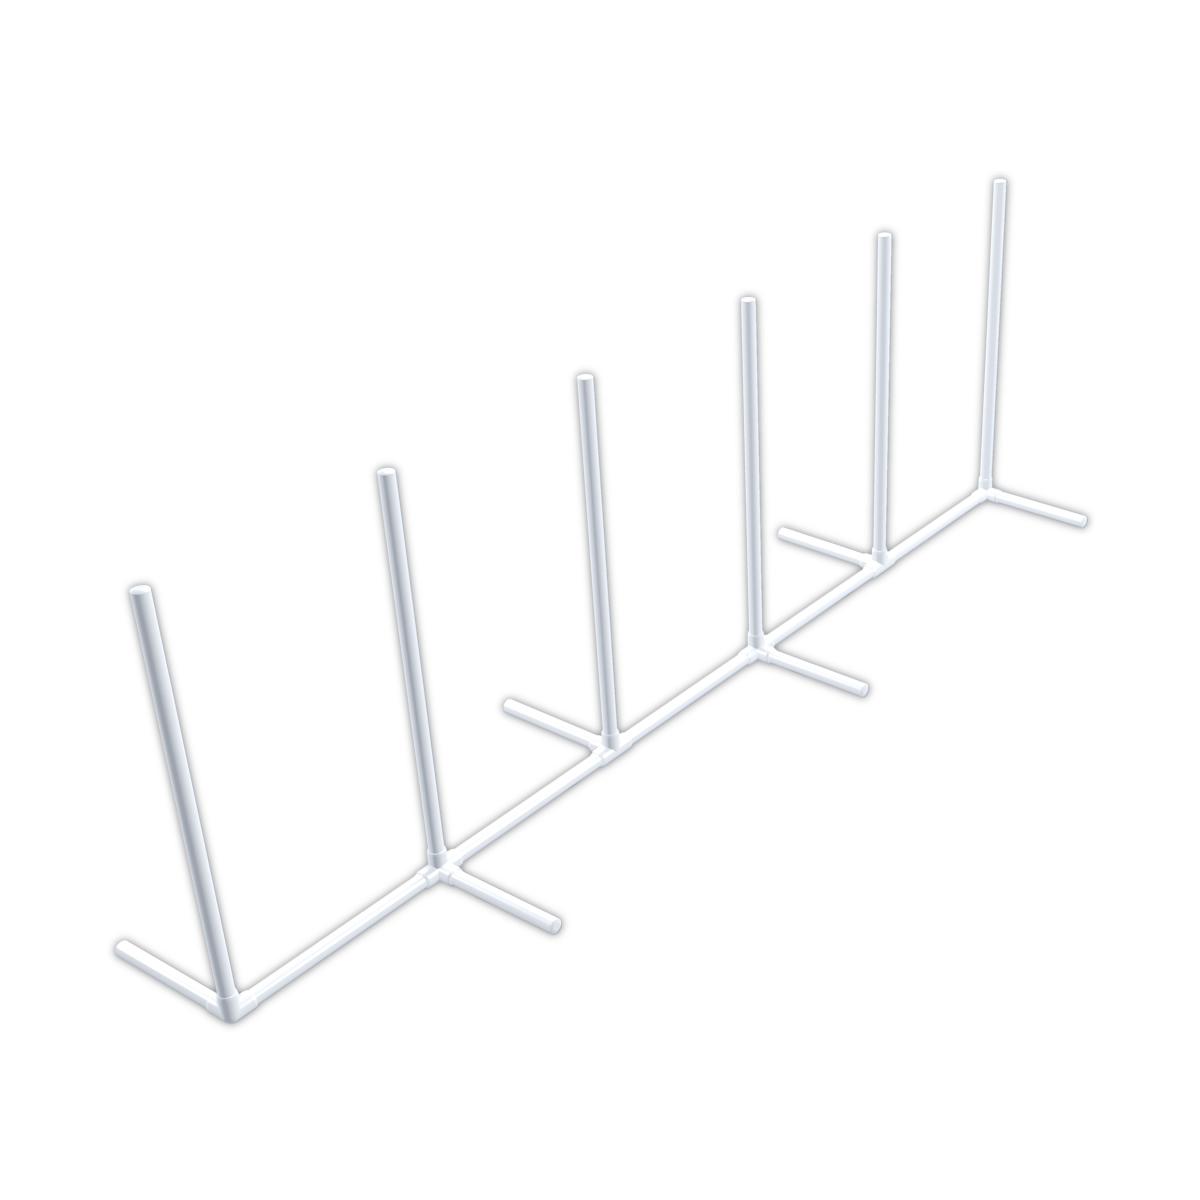 pvc dog agility weaver poles